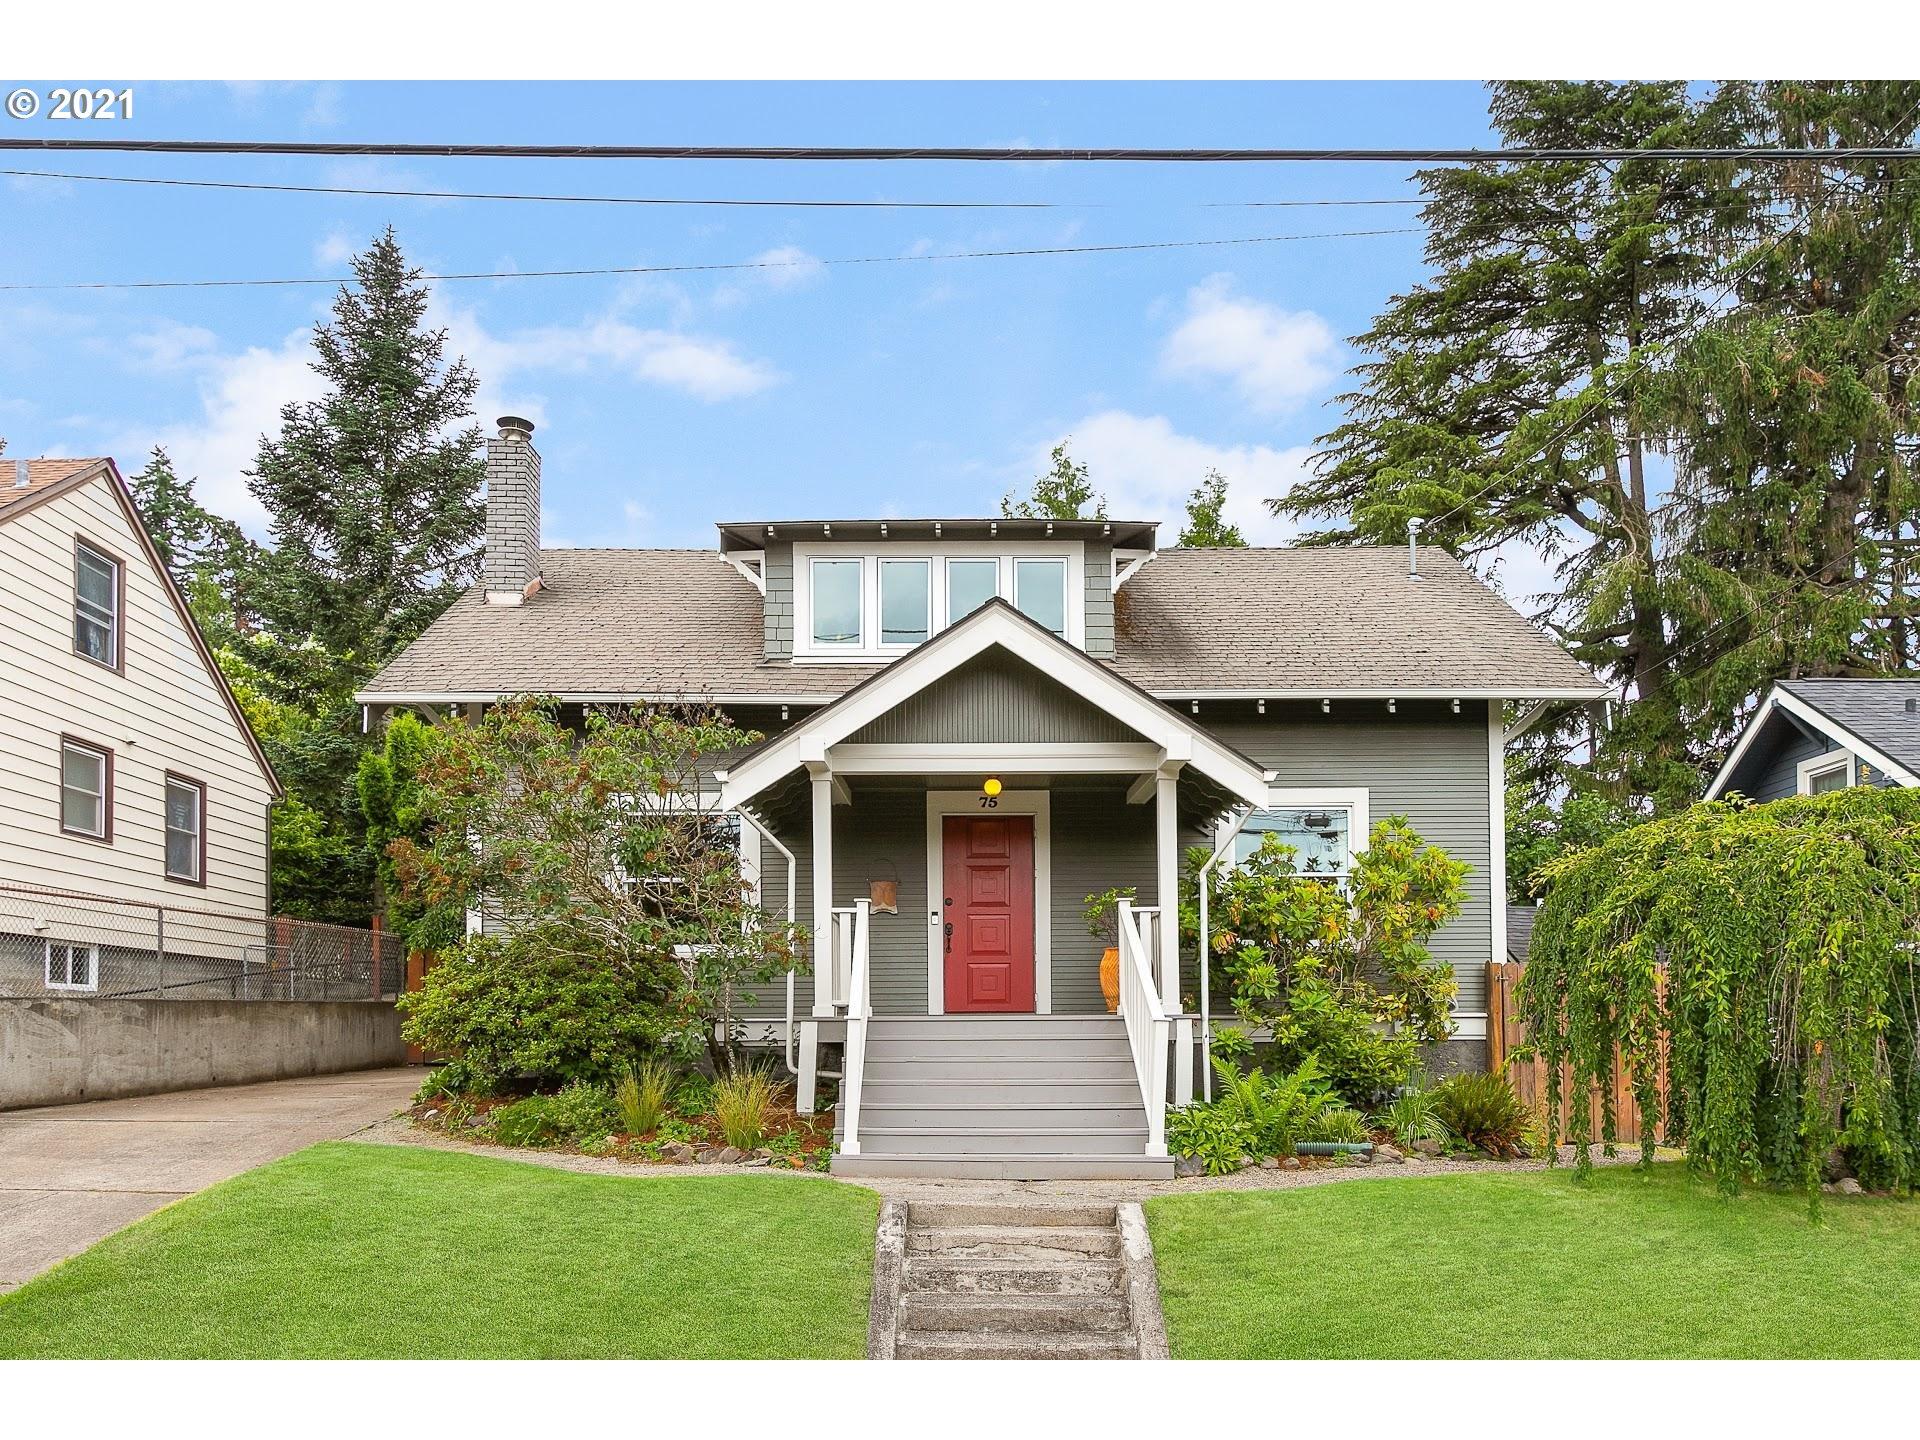 75 SE 72ND AVE, Portland OR 97215